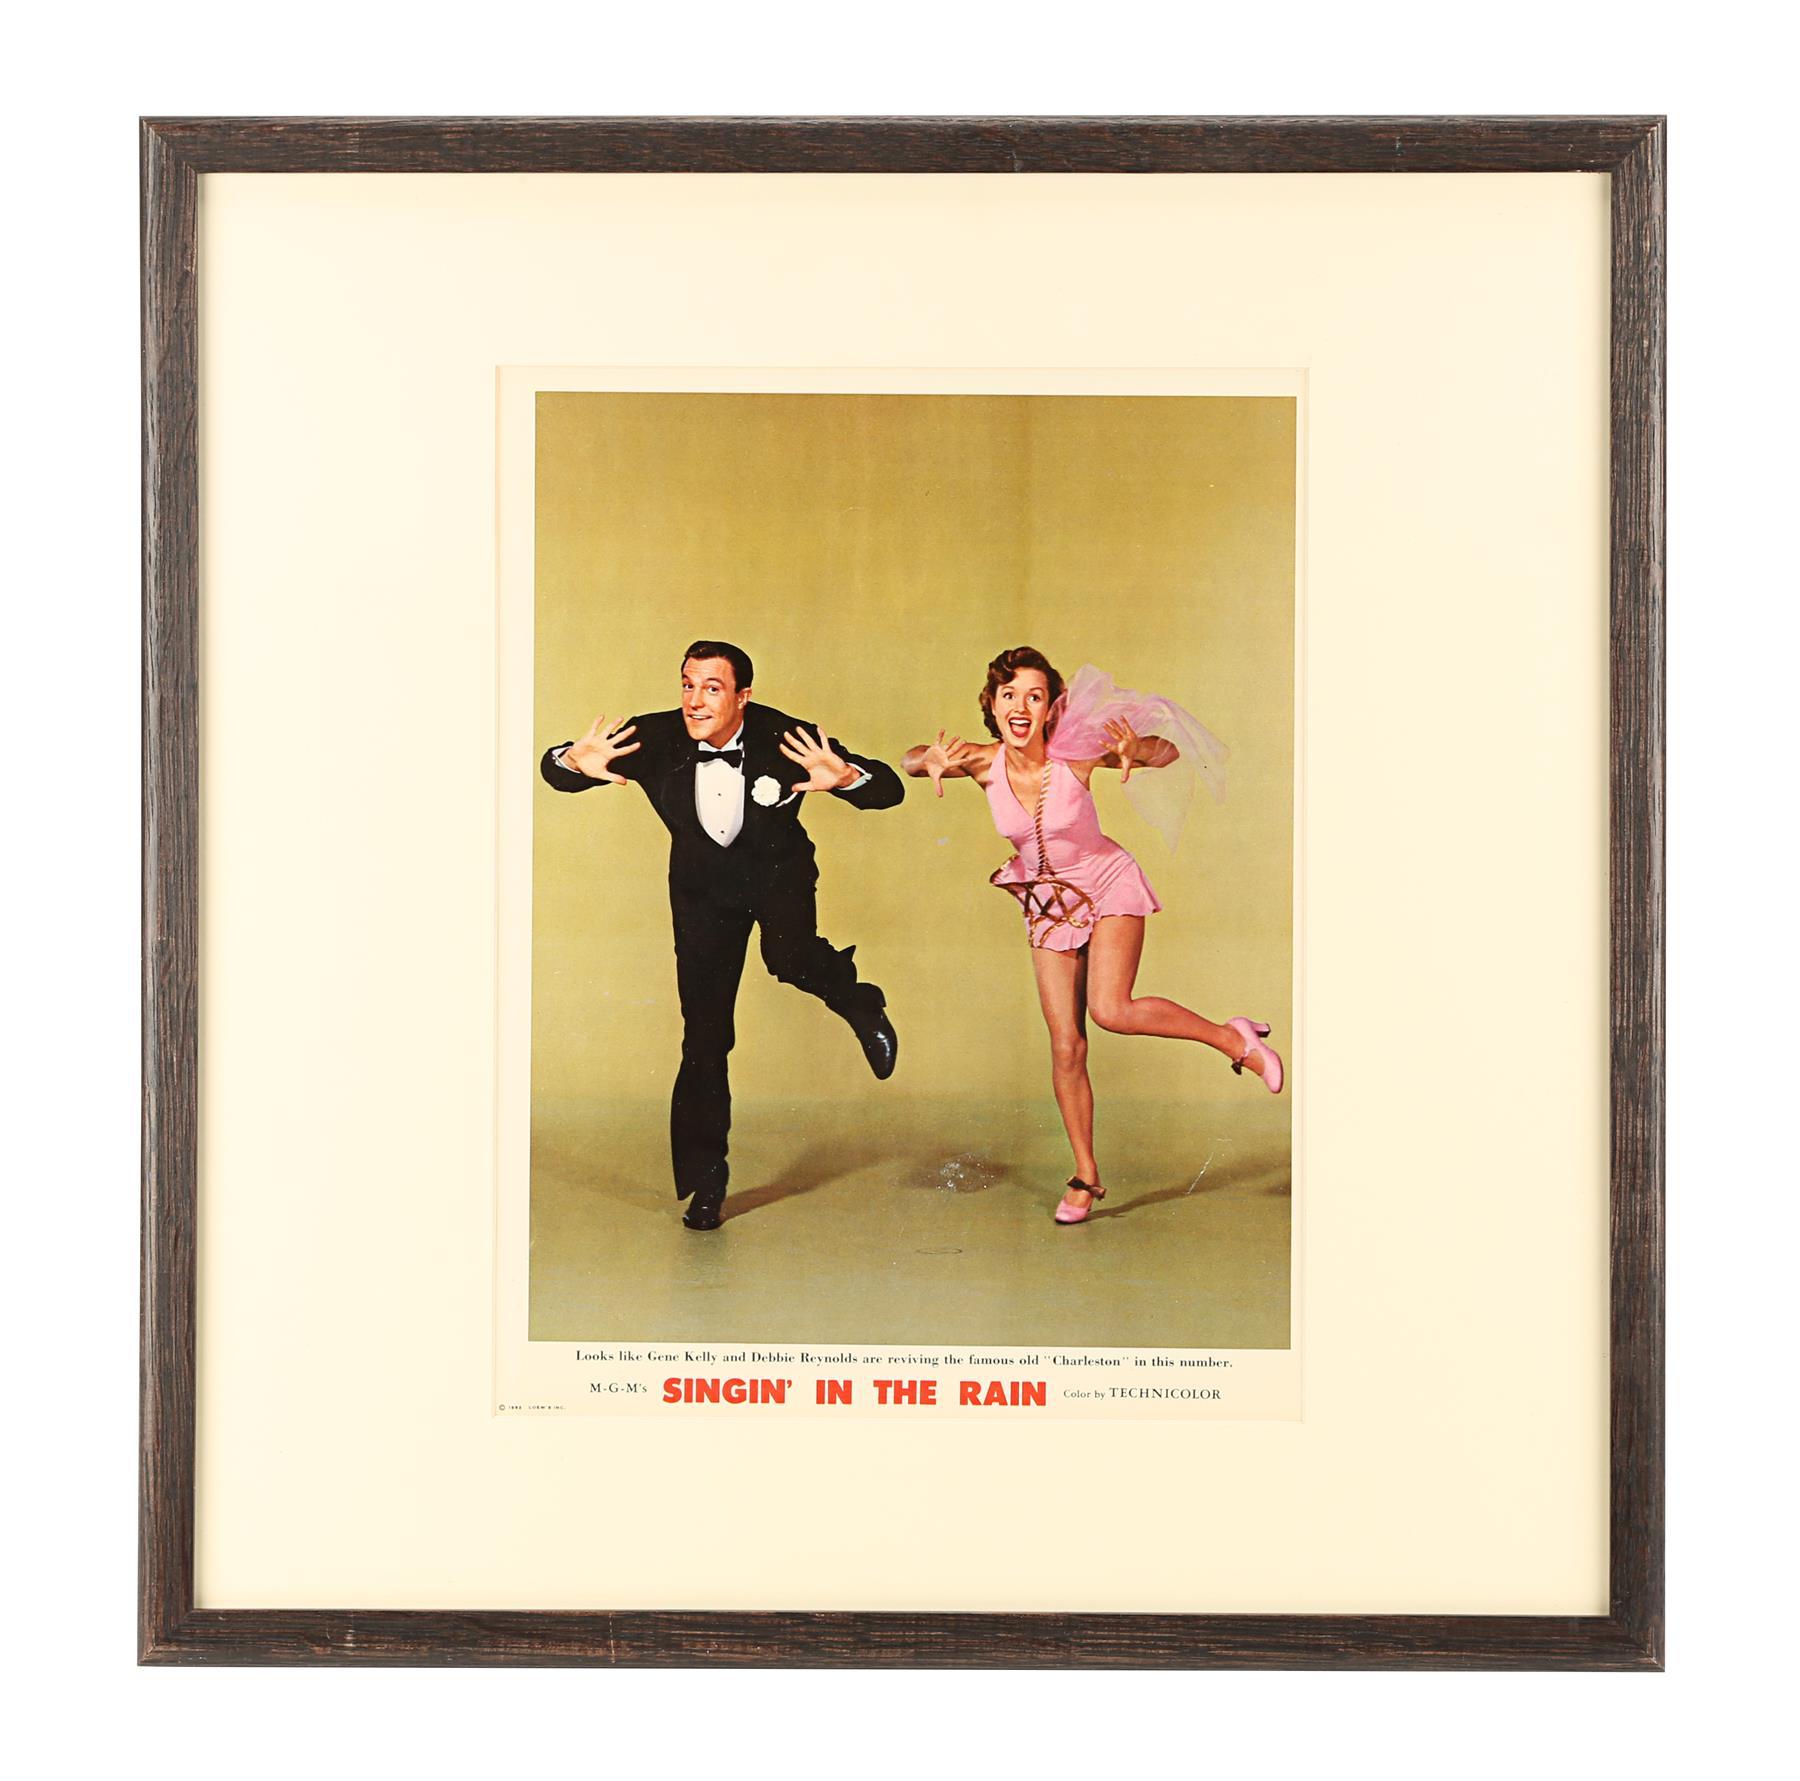 SINGIN' IN THE RAIN (1952) - Deluxe Lobby Card, 1952